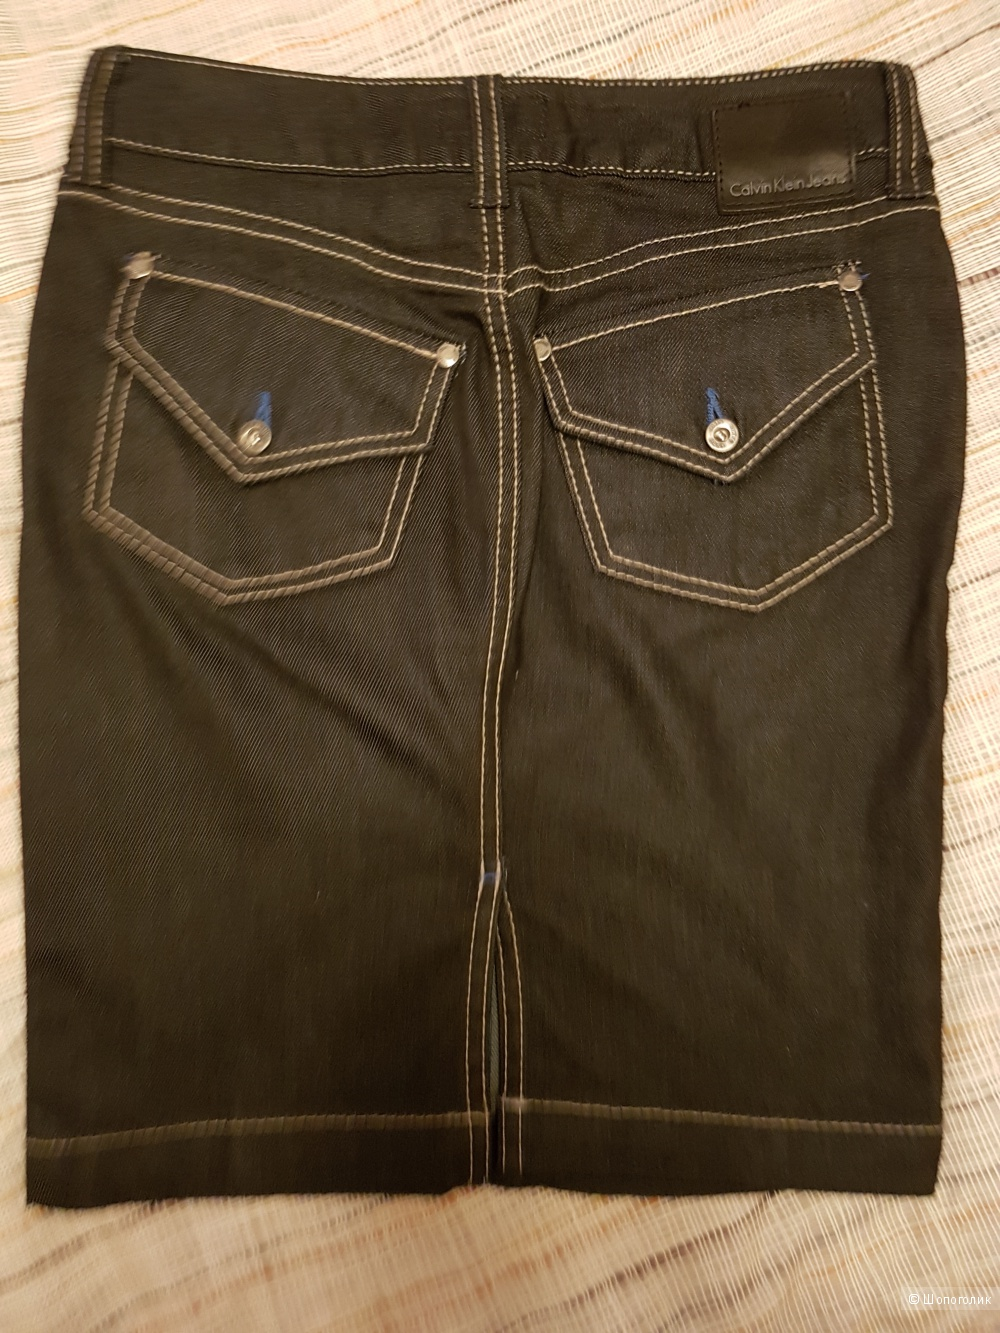 Джинсовая юбка CALVIN KLEIN, размер XS